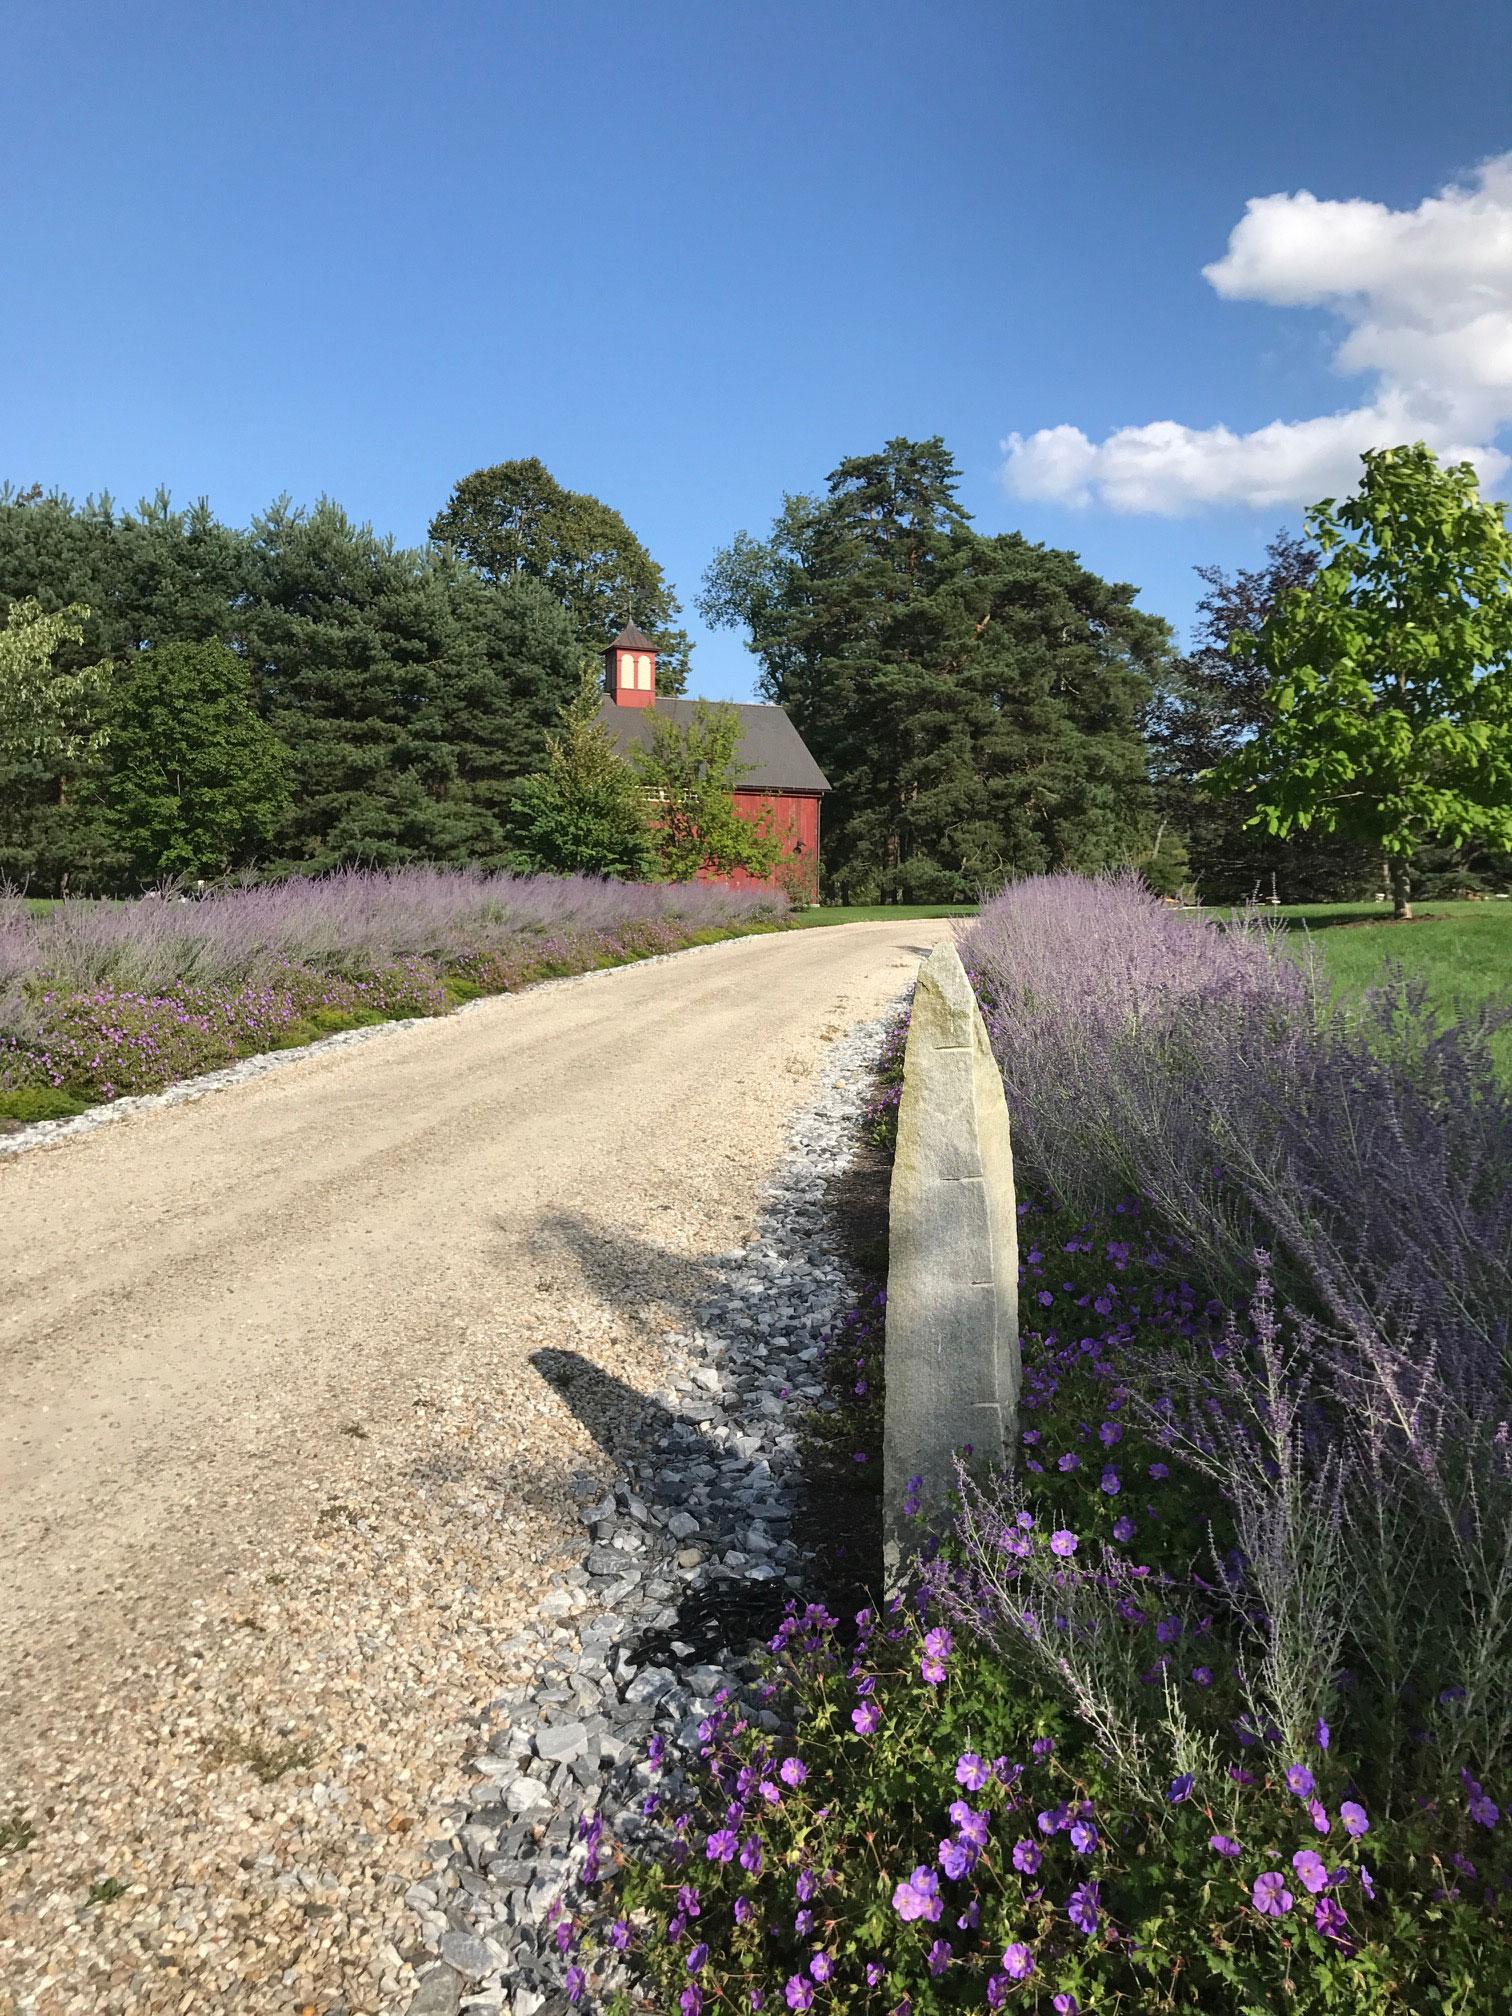 LB-Farm-front-entry-at-road-2